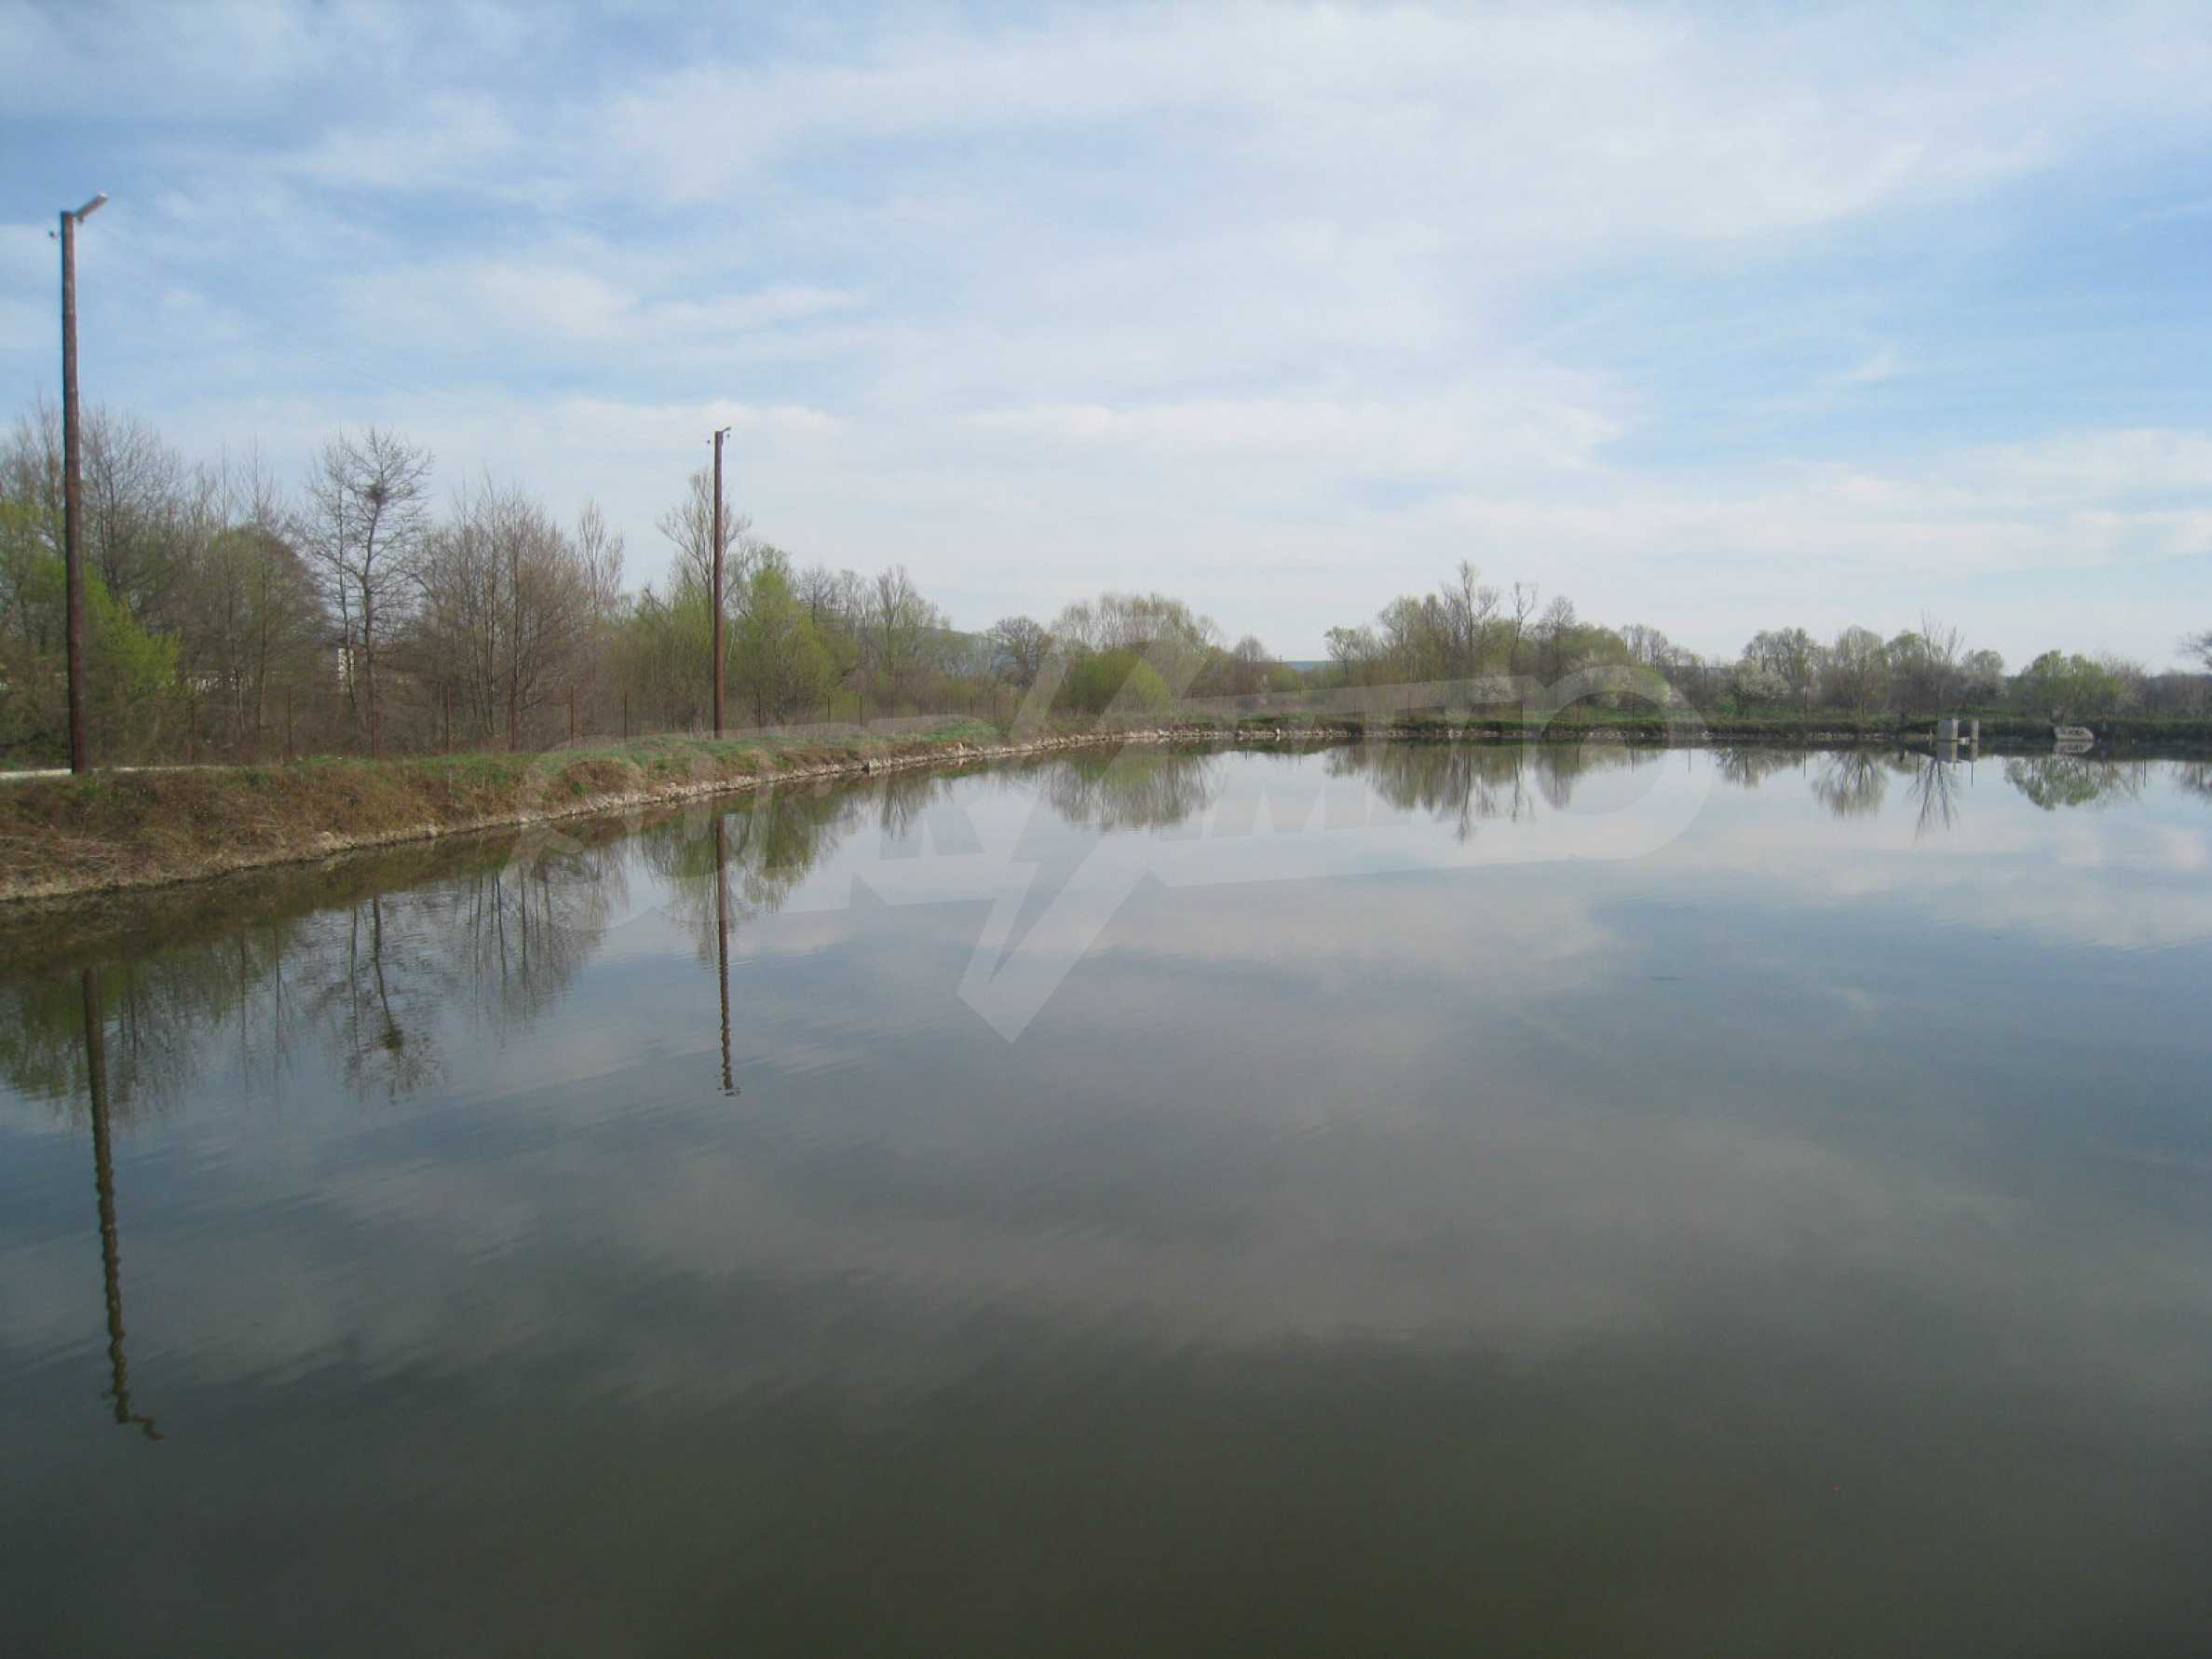 Fishpond, warehouses, residential areas and asphalt ground near Montana 23